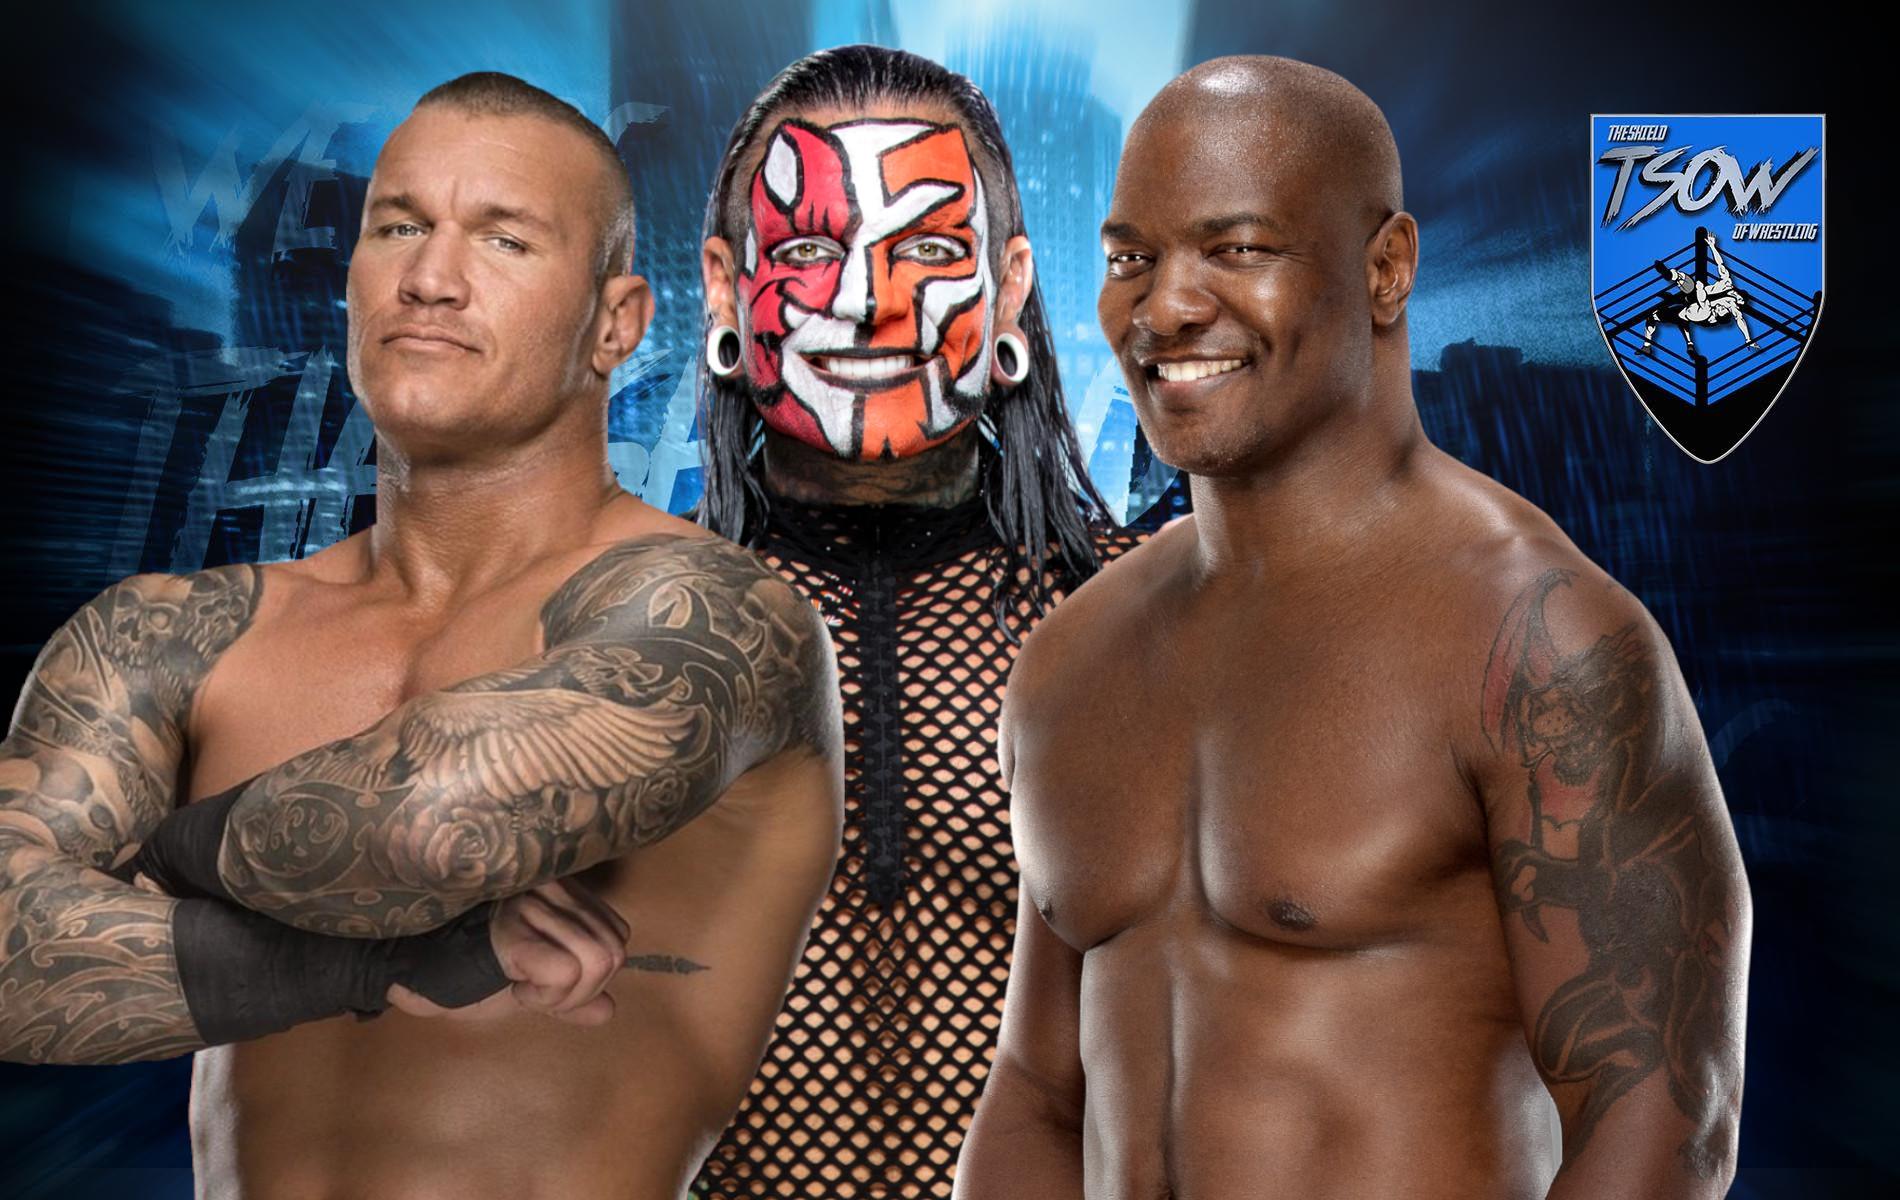 Randy Orton, Shelton Benjamin e Jeff Hardy: curiosa statistica a RAW